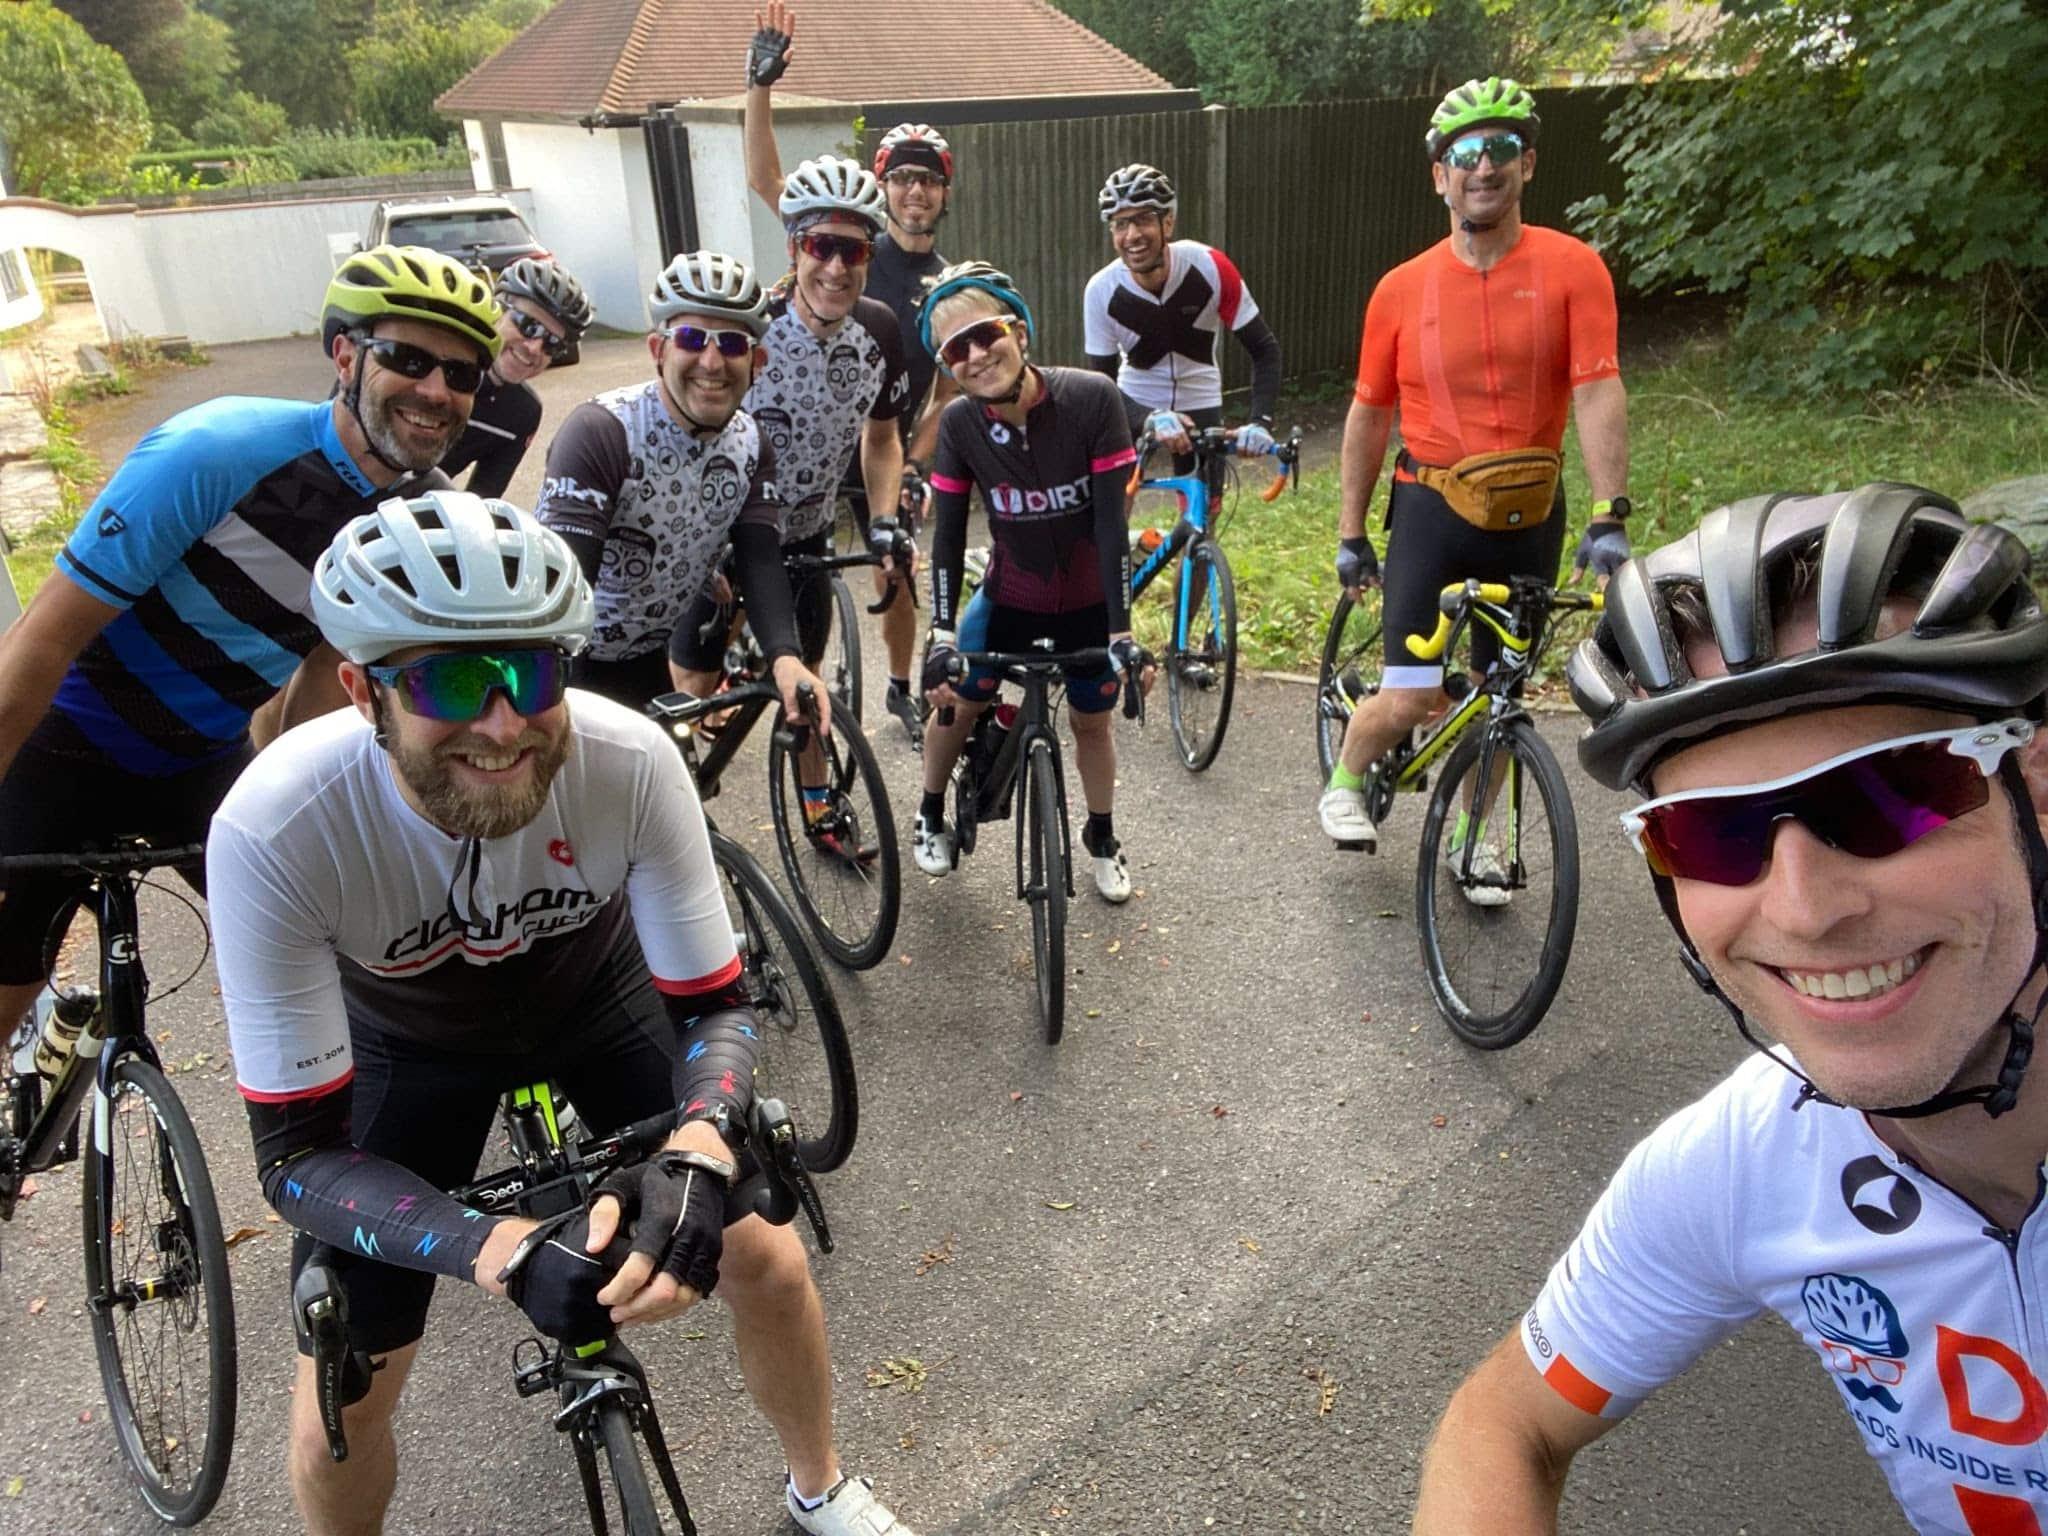 DIRT Zwift team takes a bike ride